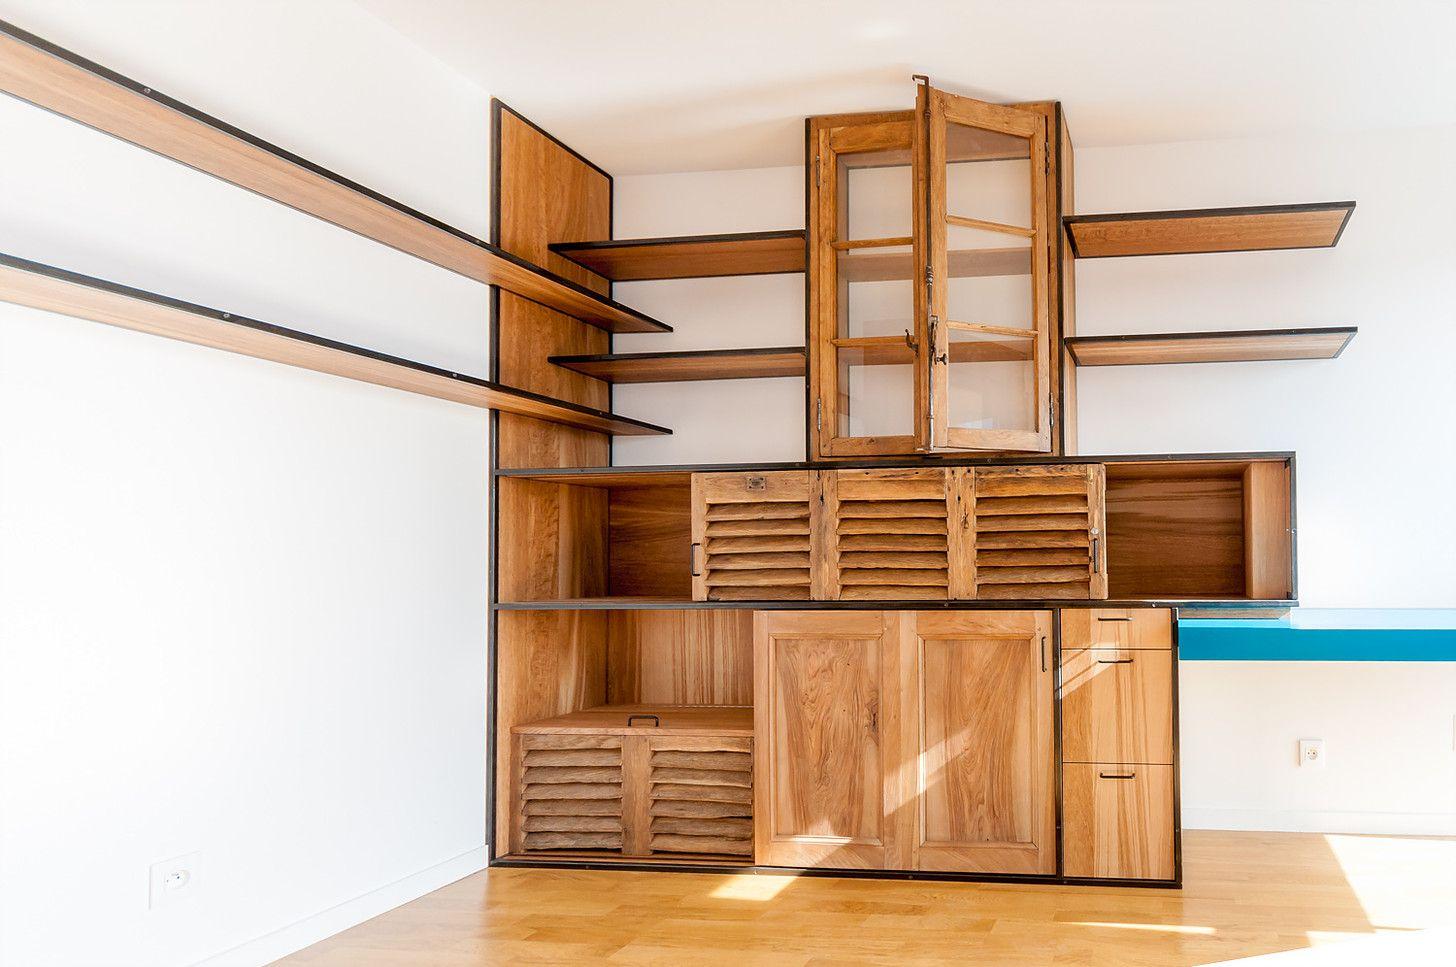 meuble r alis sur mesure en ch ne brun massif ch ne. Black Bedroom Furniture Sets. Home Design Ideas